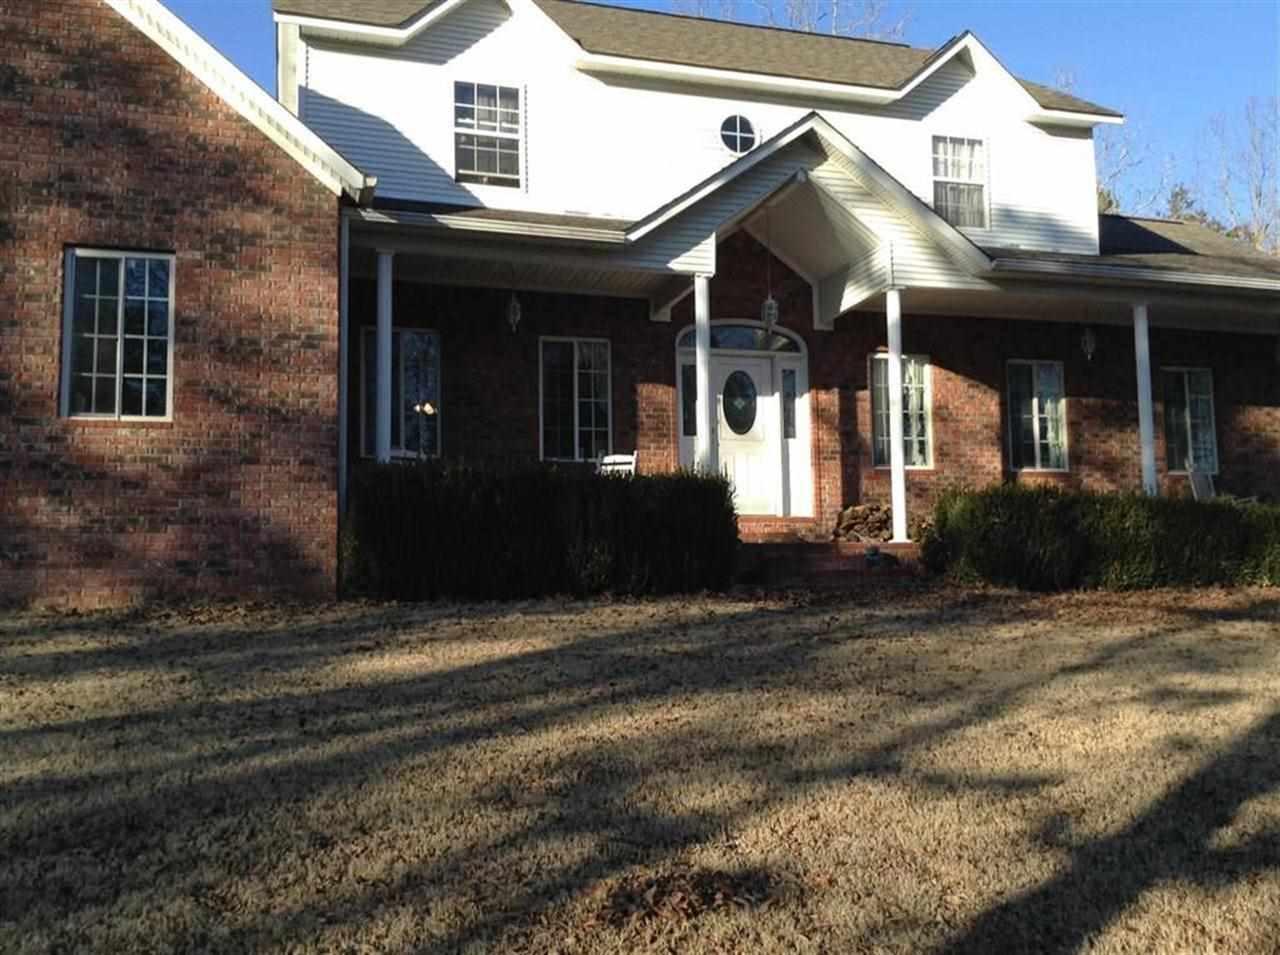 royal arkansas real estate and homes for sale realtytrac